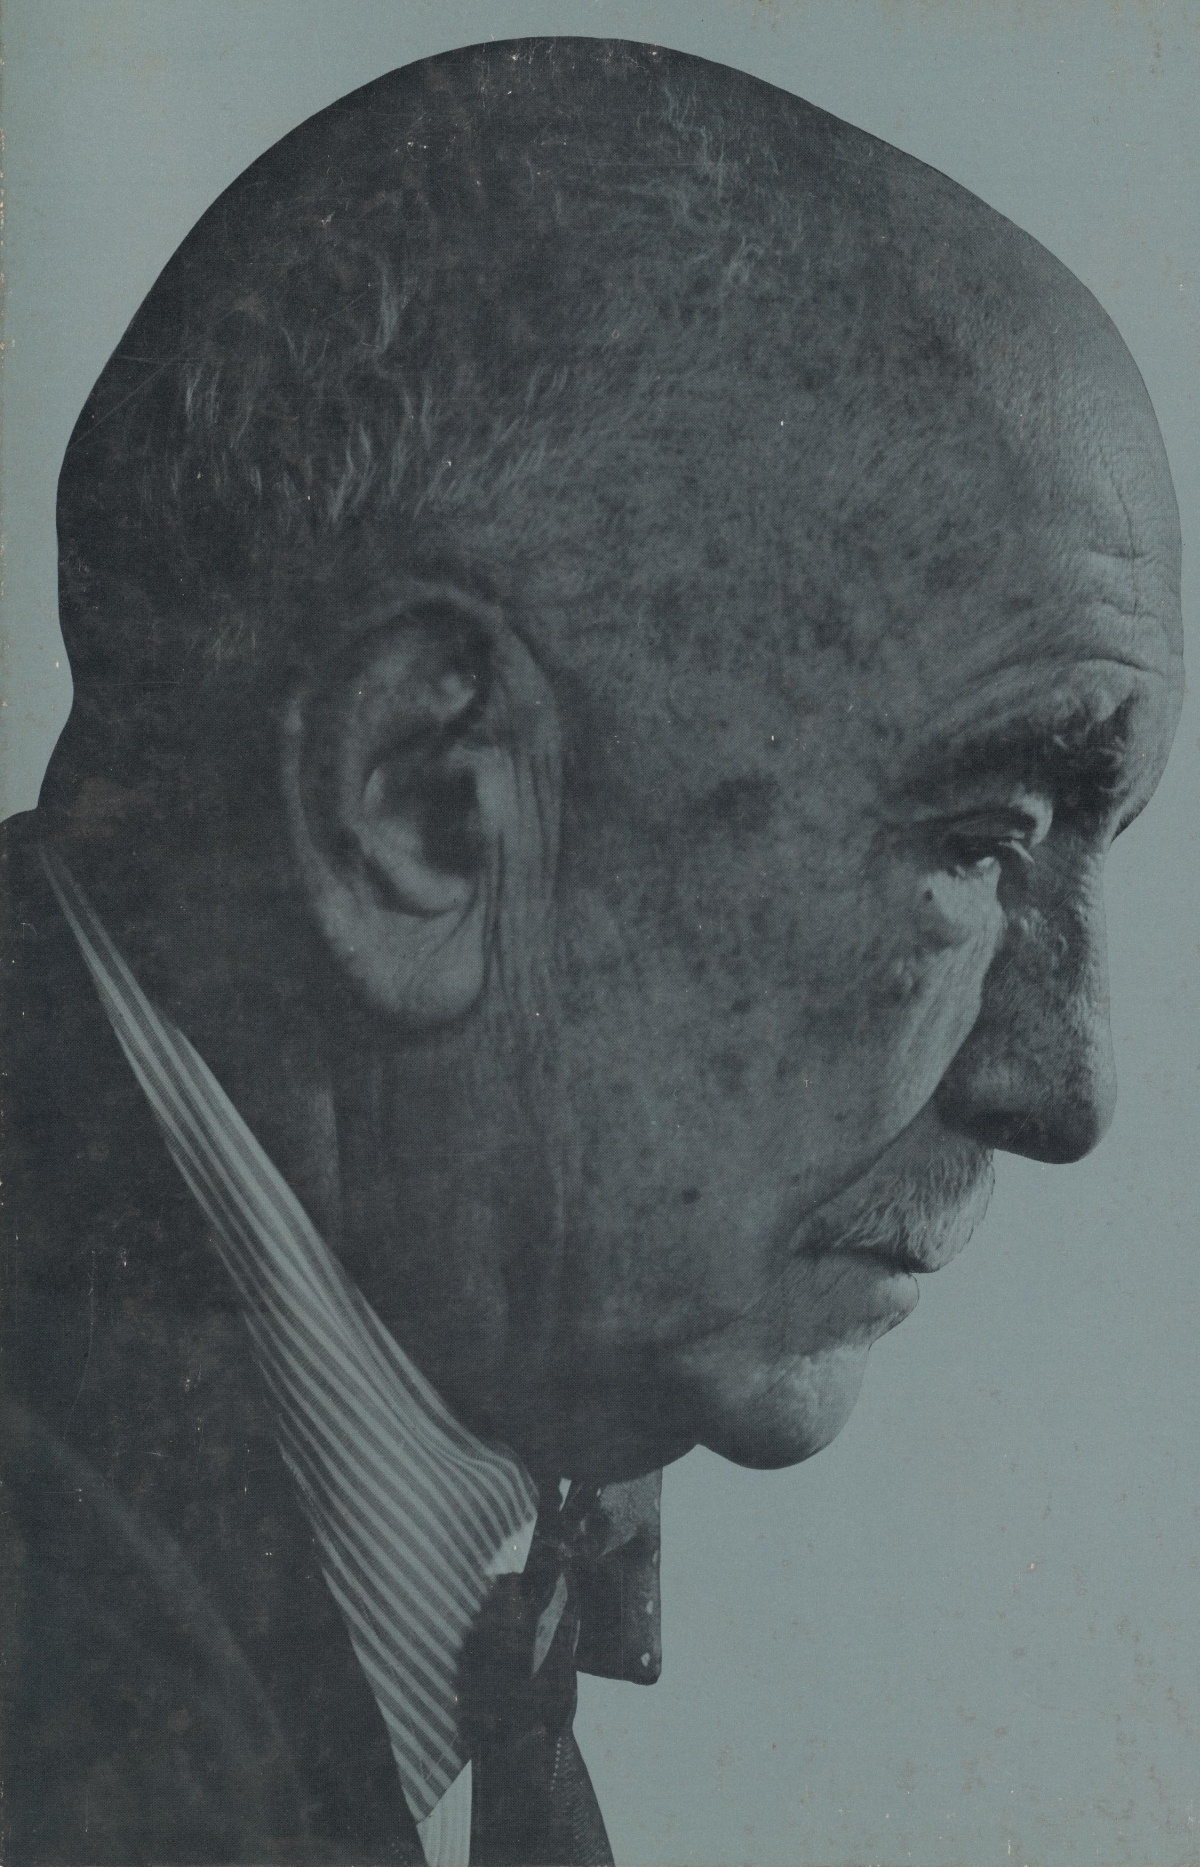 Richard STRAUSS, Richard STRAUSS, un portrait fait par Yousuf KARSH (https://karsh.org/)